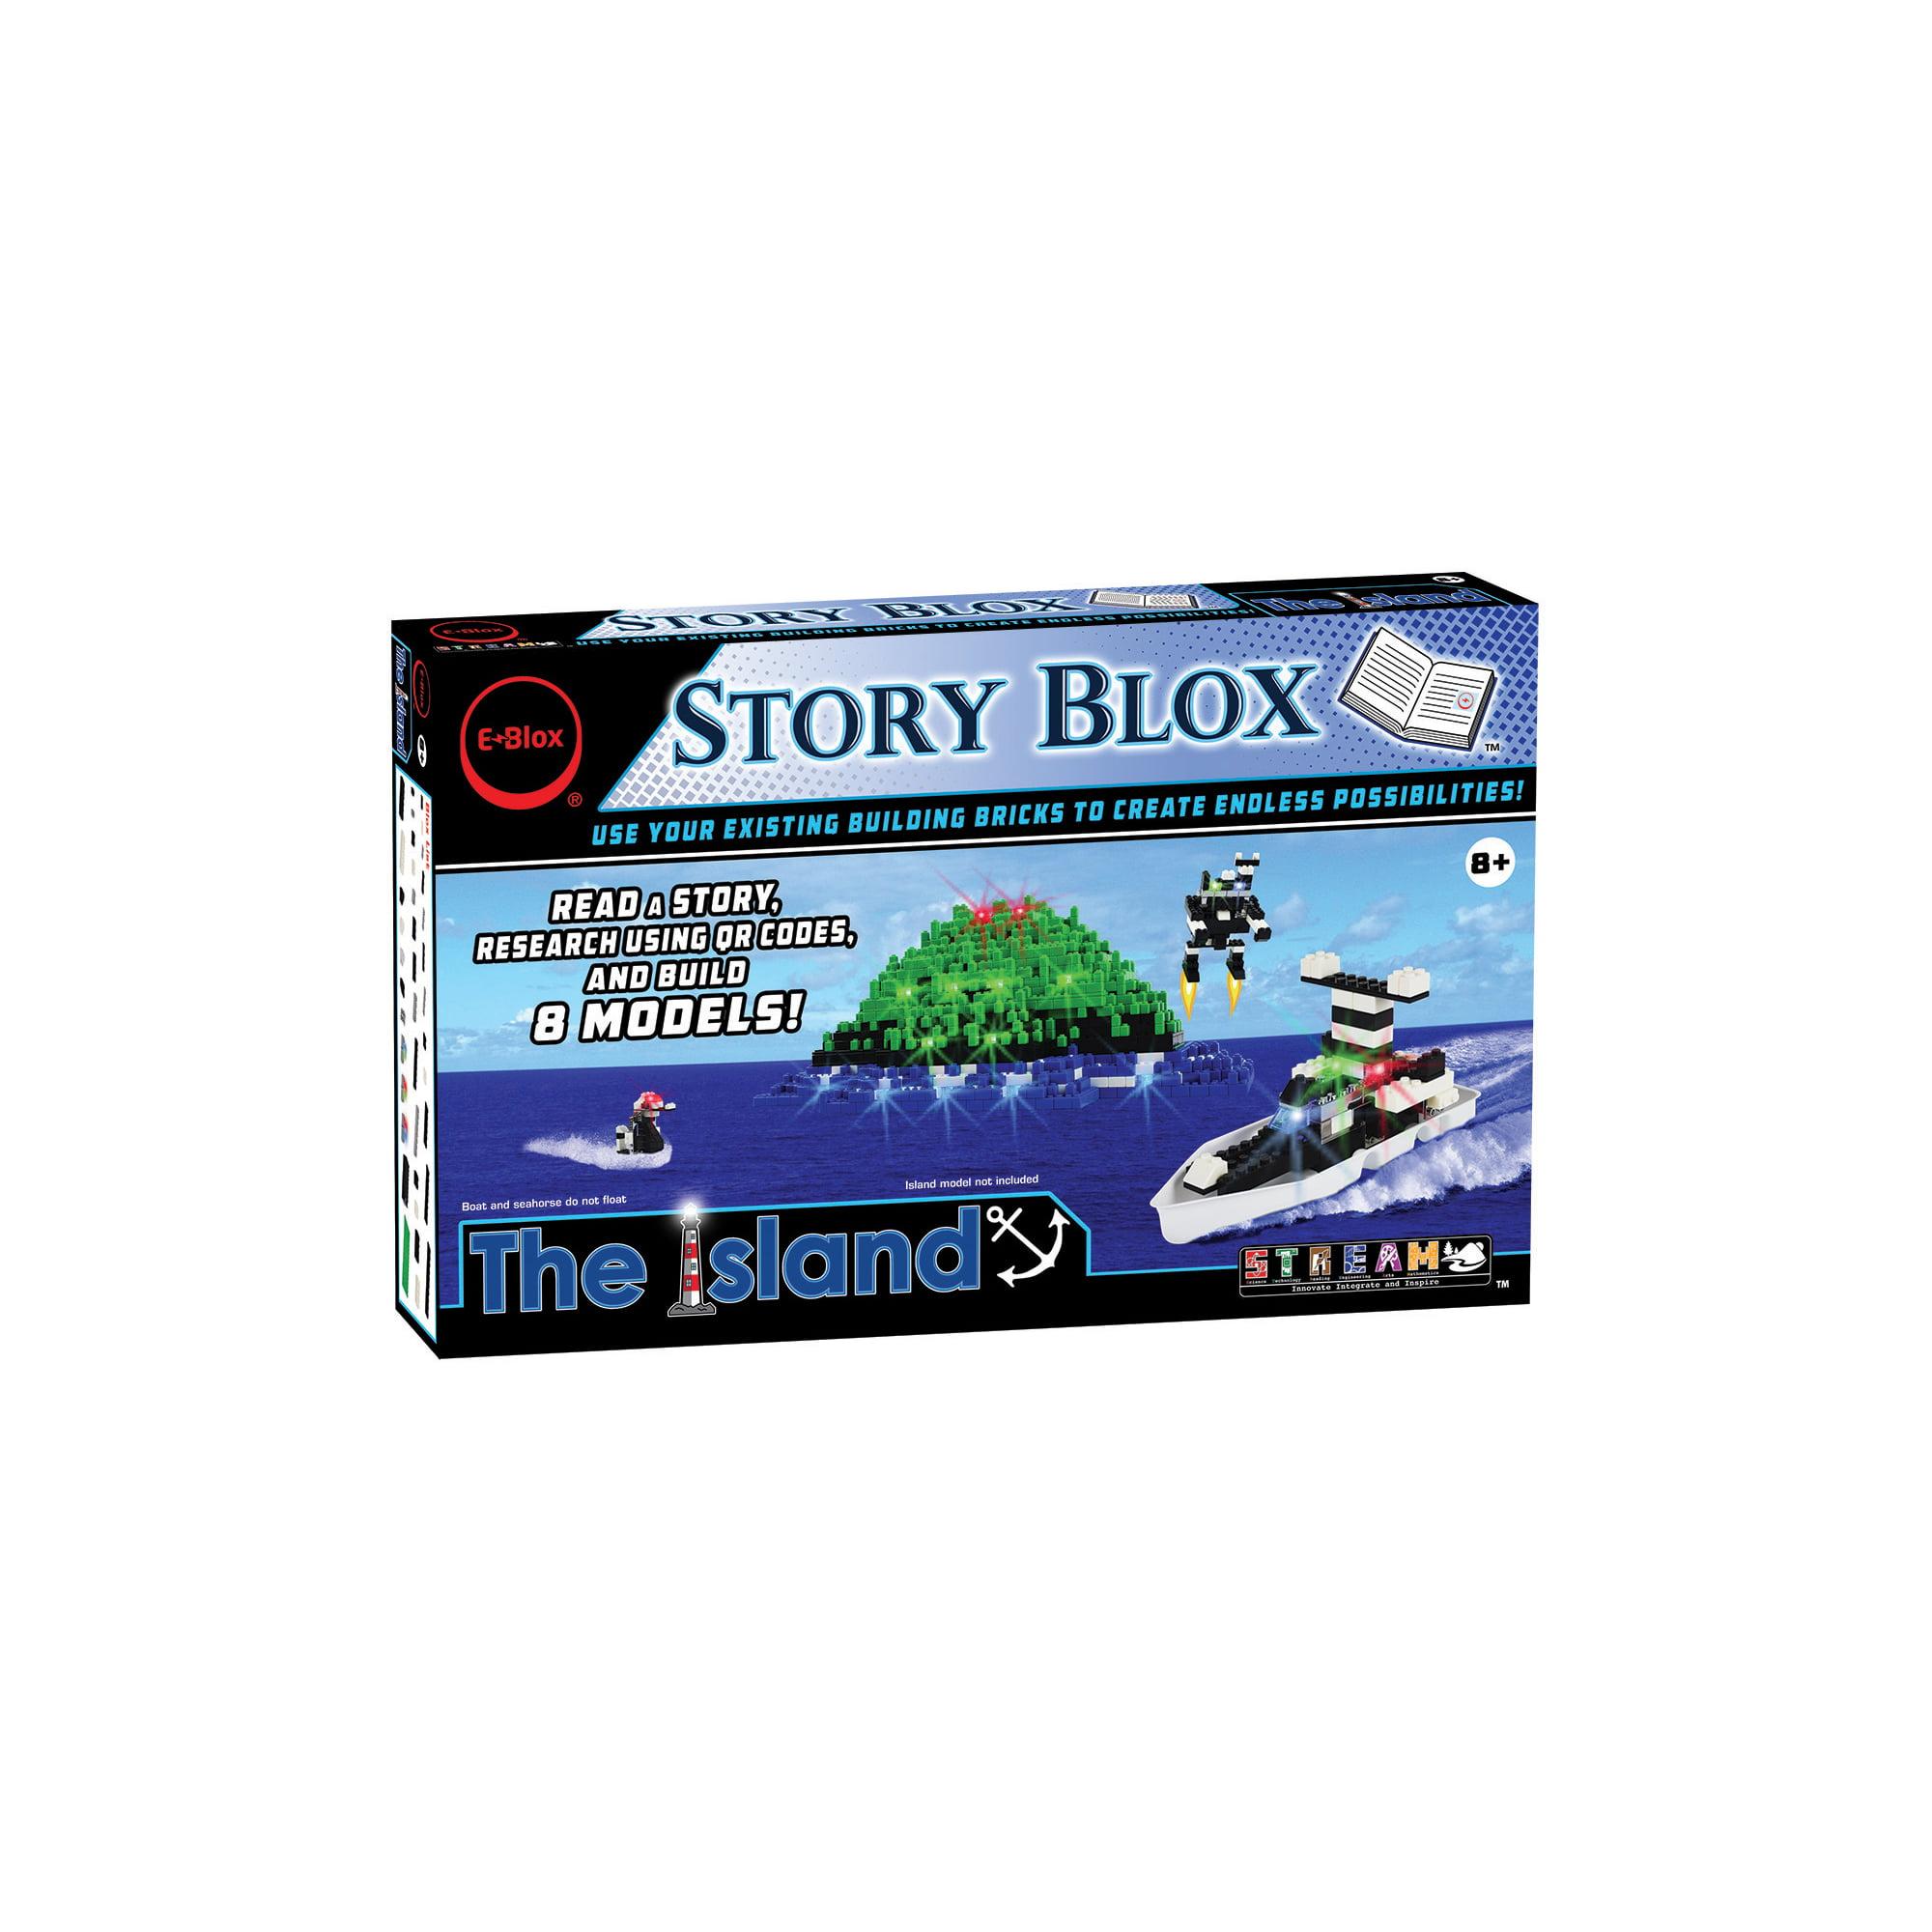 E-Blox Stories - the Island Building Set